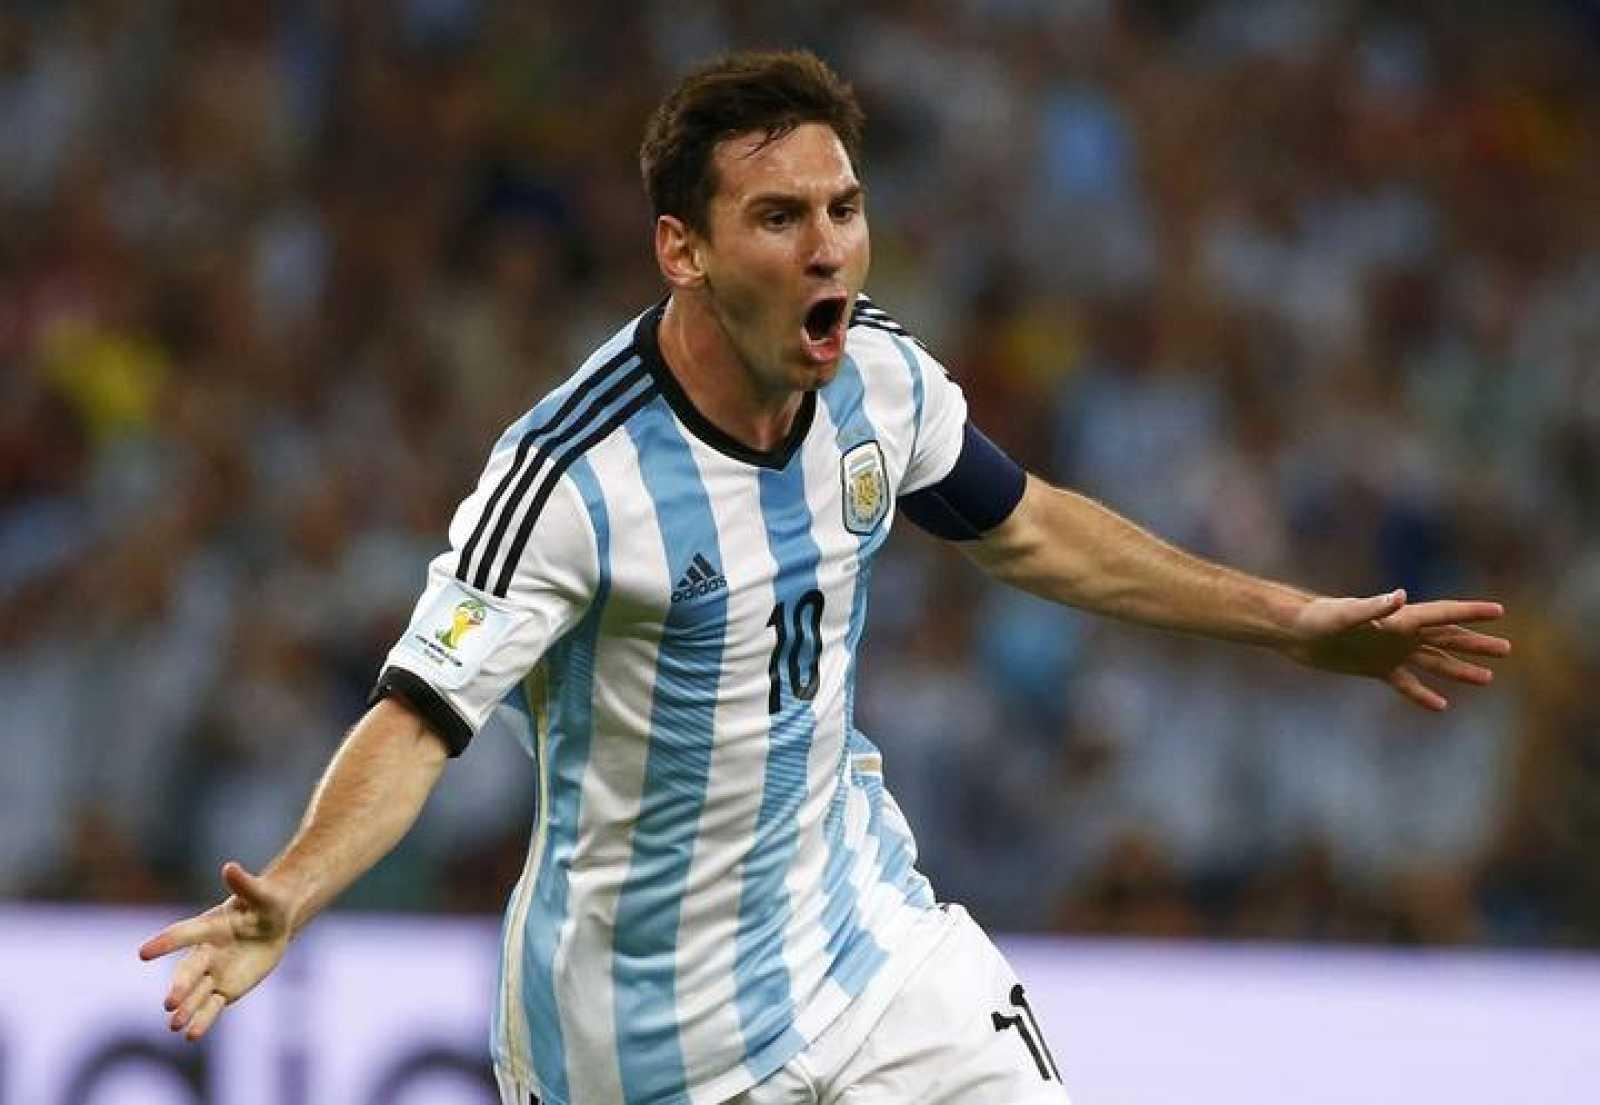 Mundial 2014: El camino de Argentina a la final: goles de Messi y ...